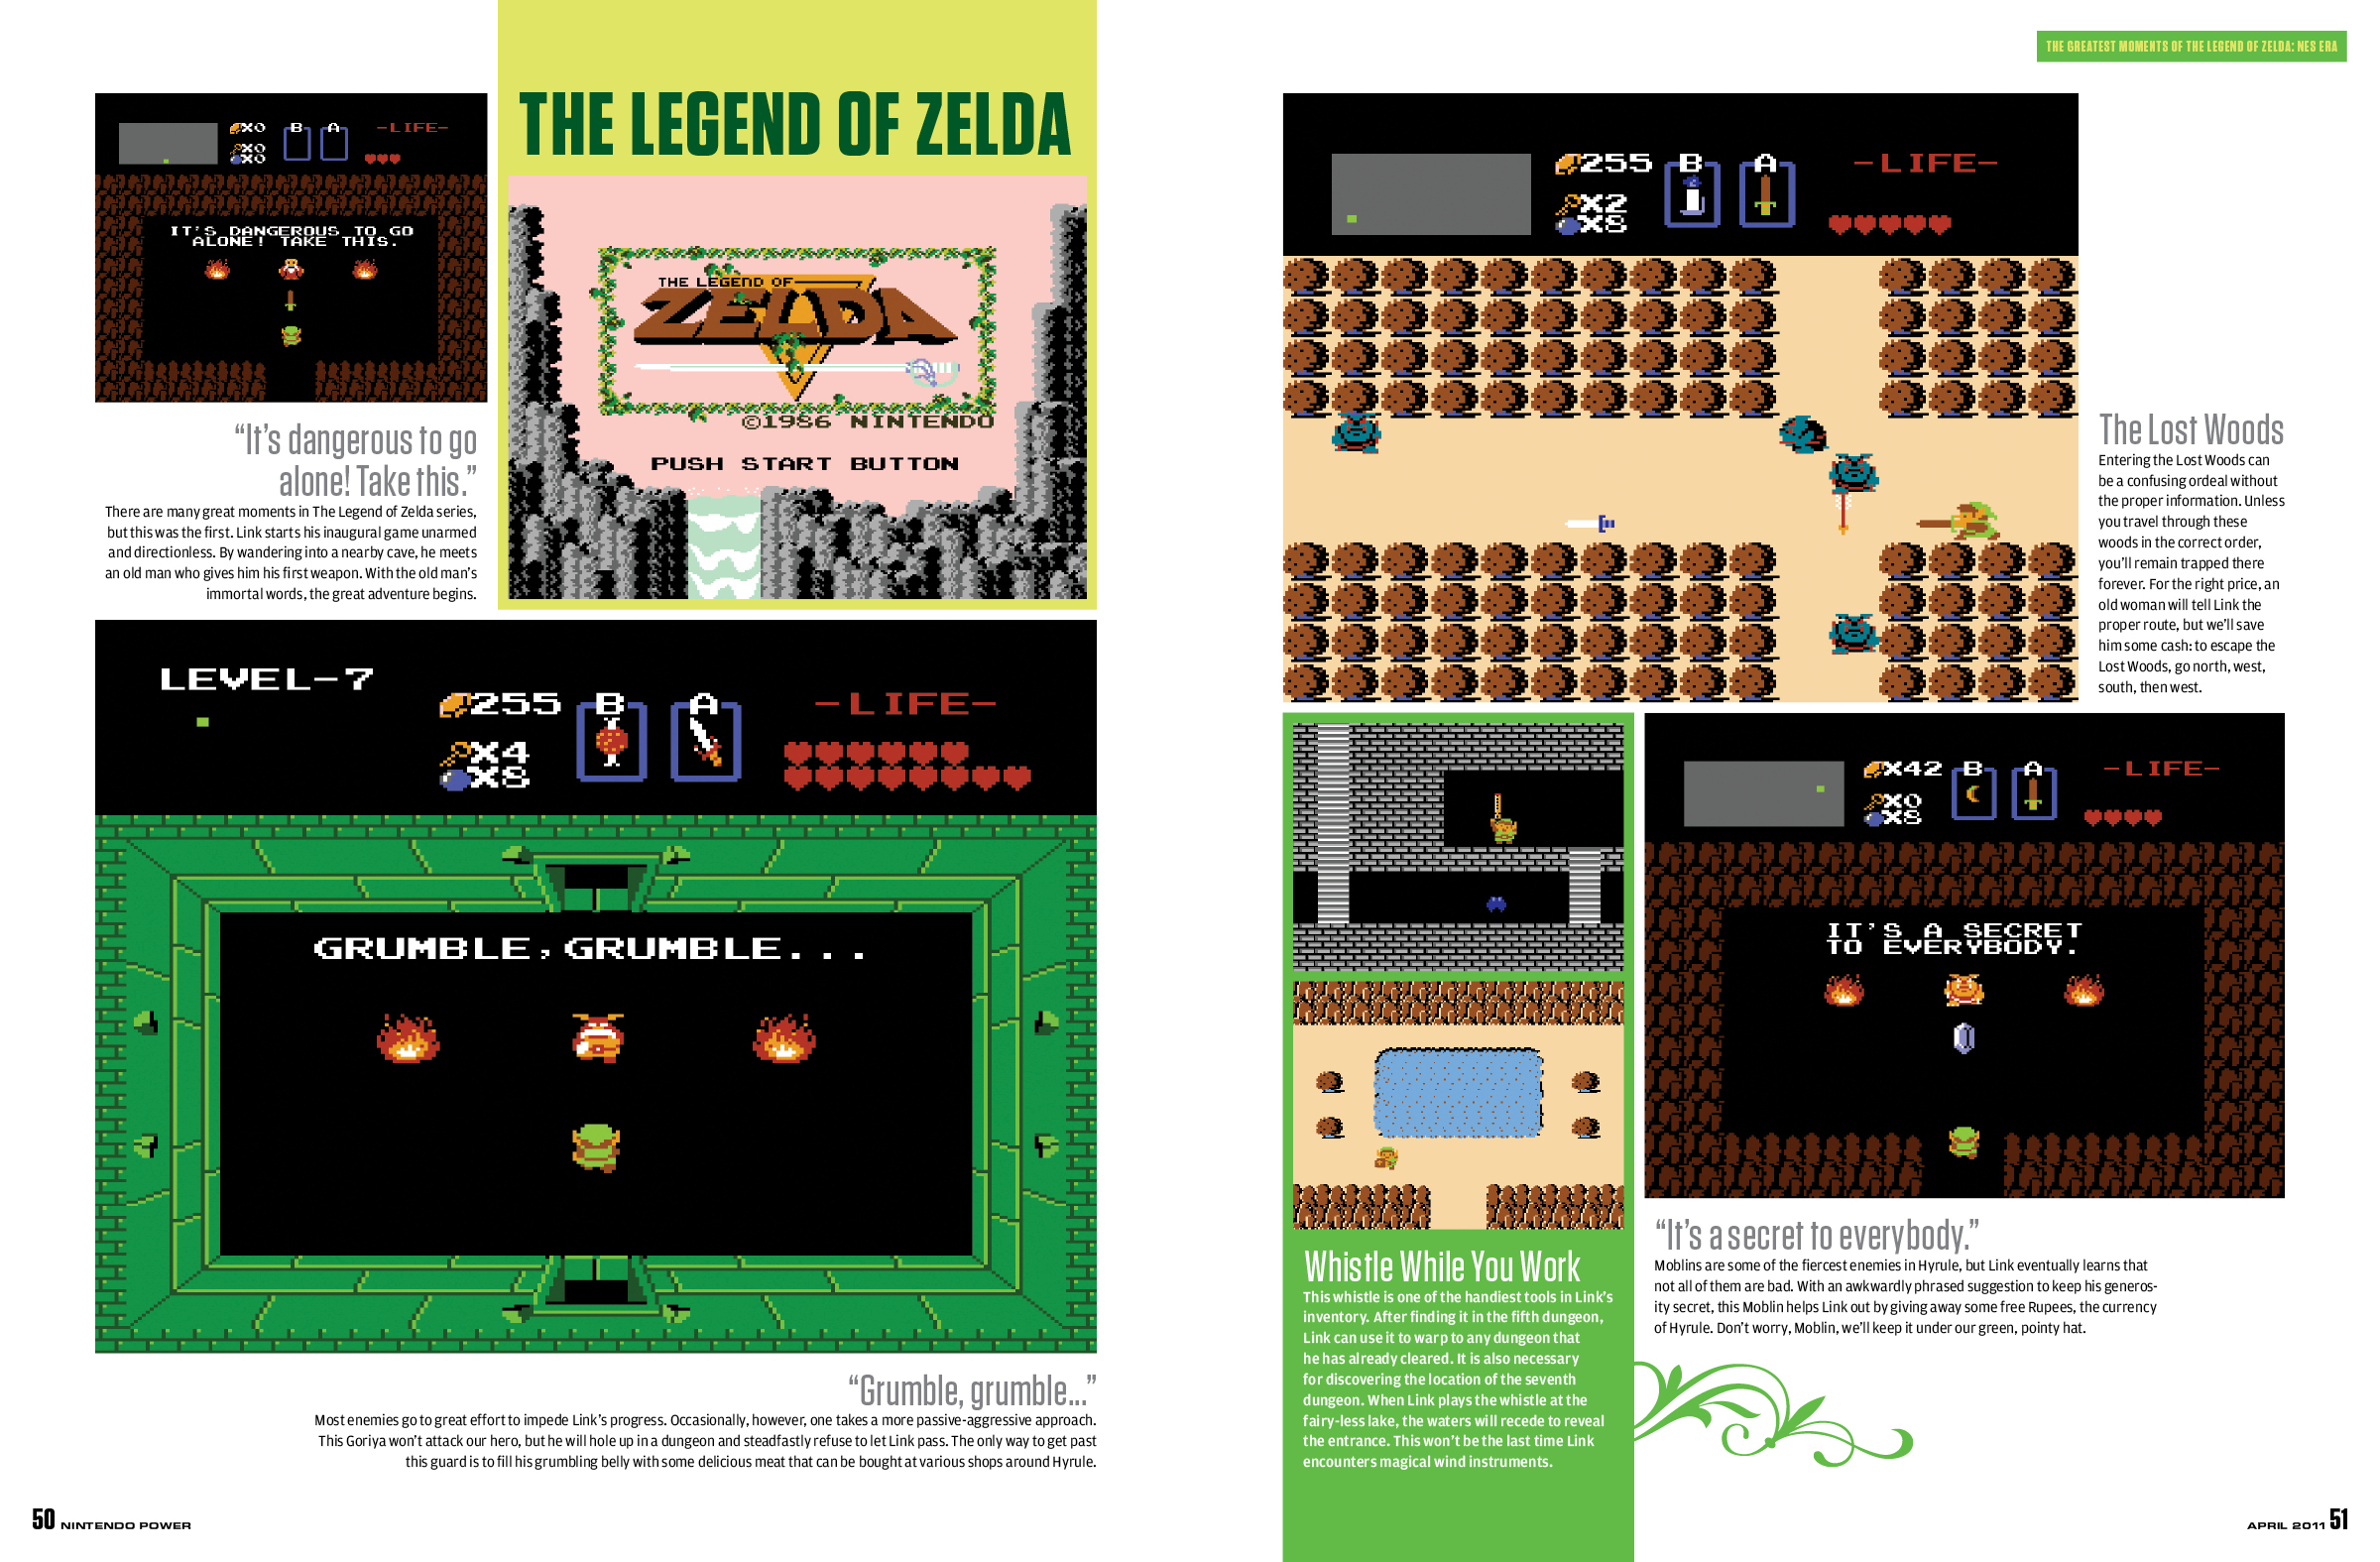 The Greatest Moments of The Legend of Zelda: NES Era